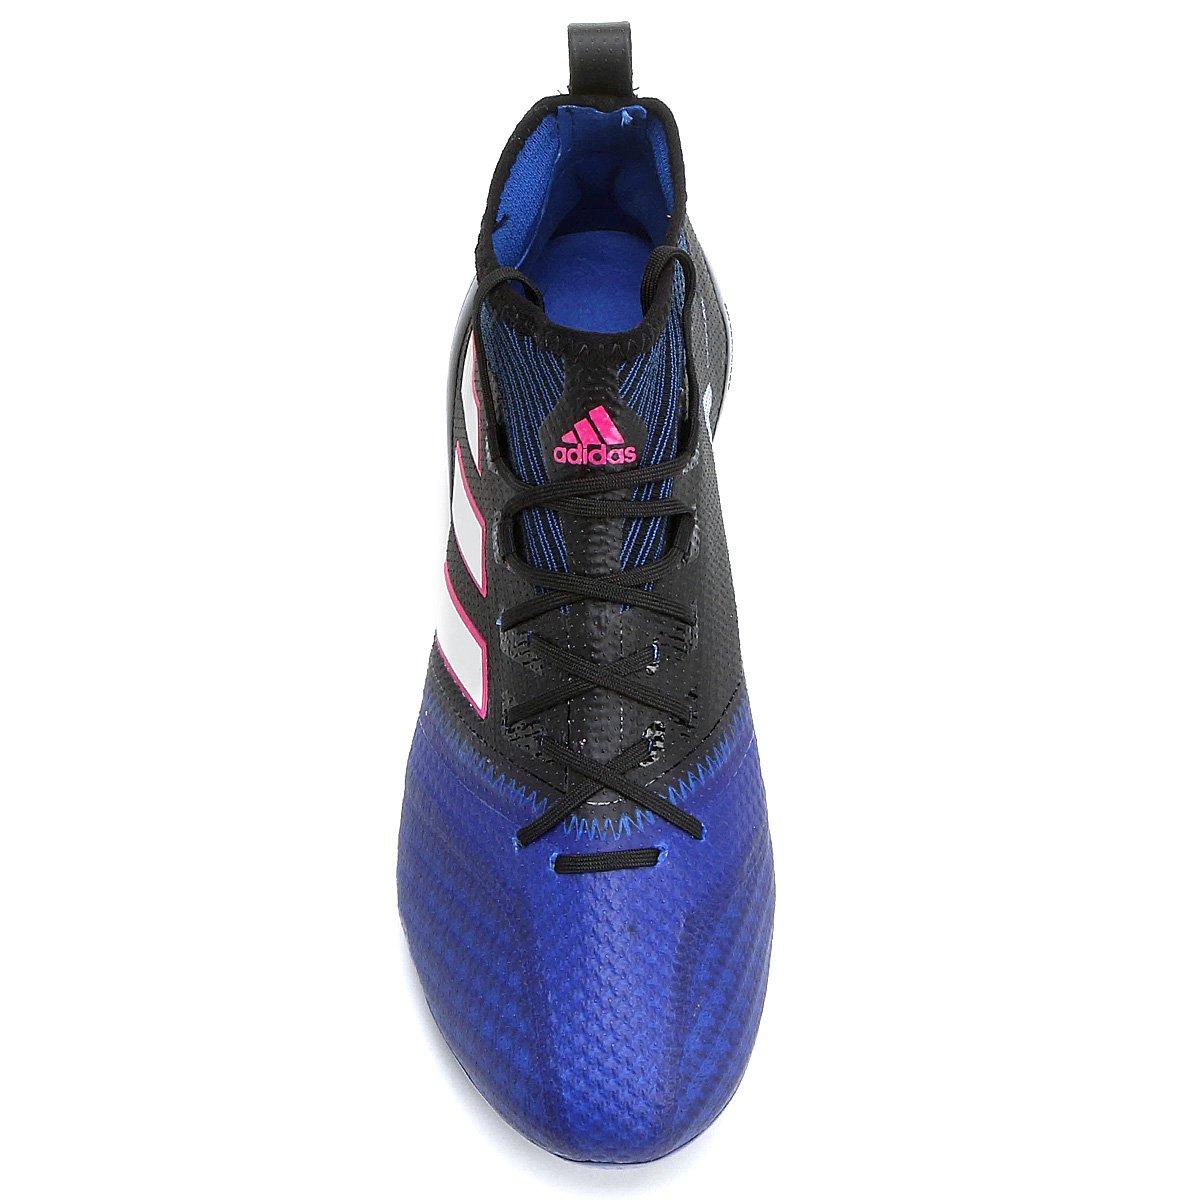 FG 17 Preto Chuteira e Azul 1 Campo Primeknit Masculina Ace Adidas Han6qwOYF